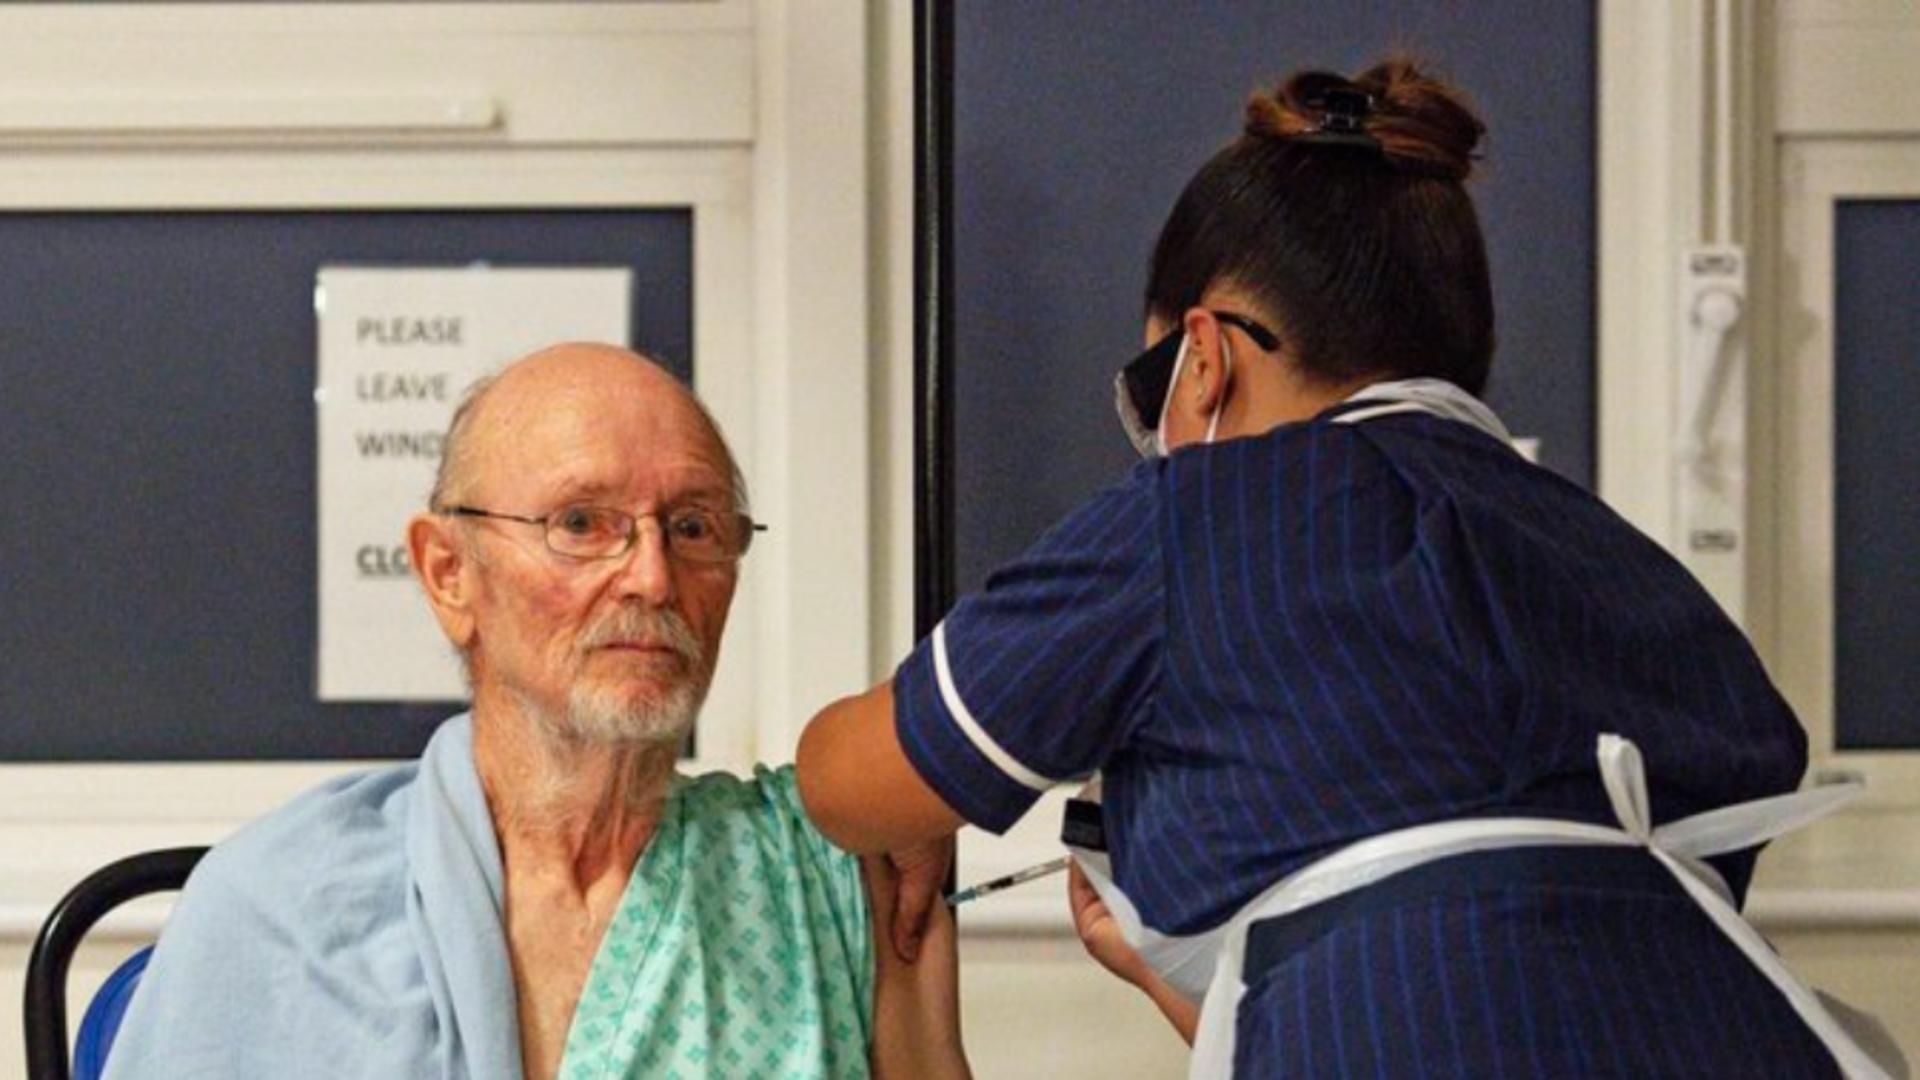 Primul bărbat vaccinat împotriva COVID-19 din lume A MURIT